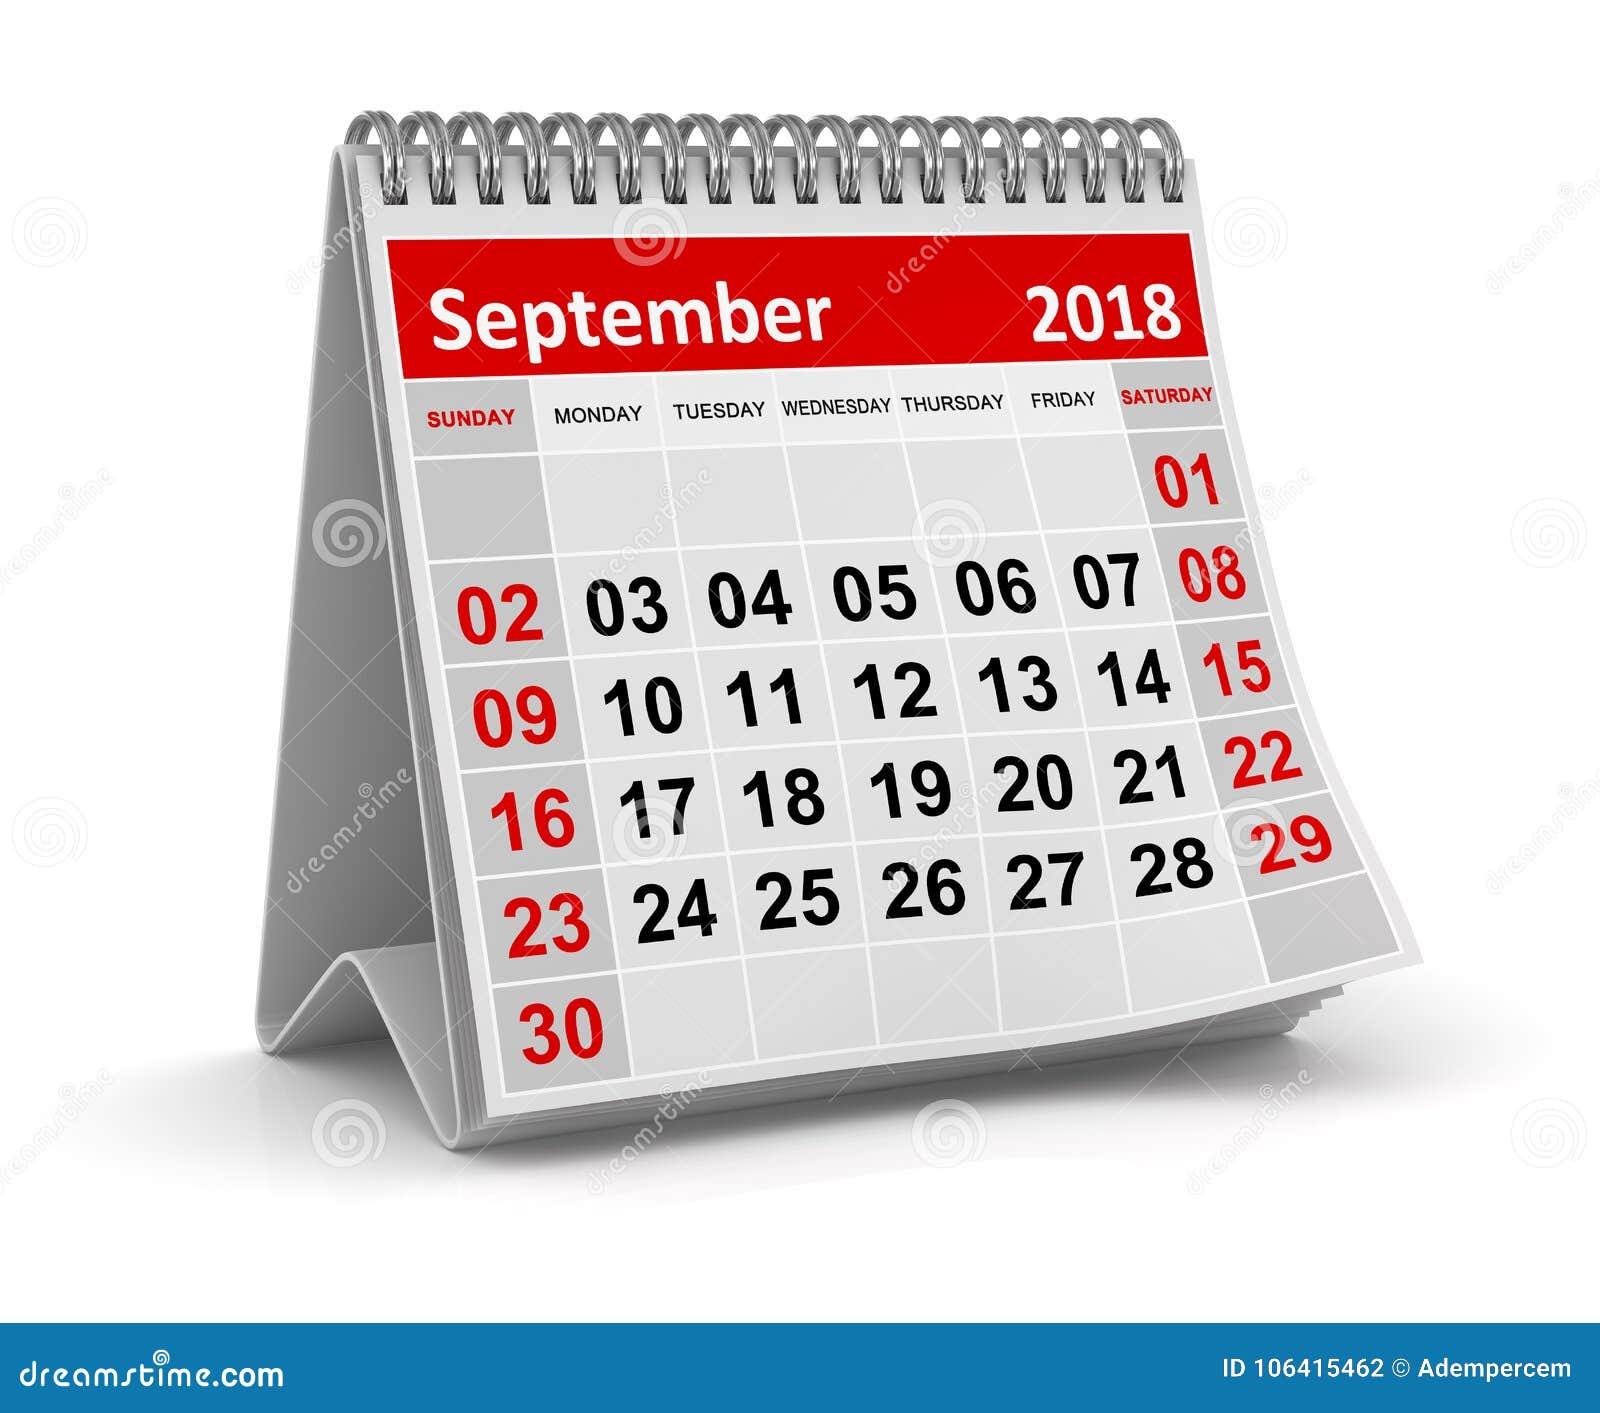 Settembre 2018 - calendario